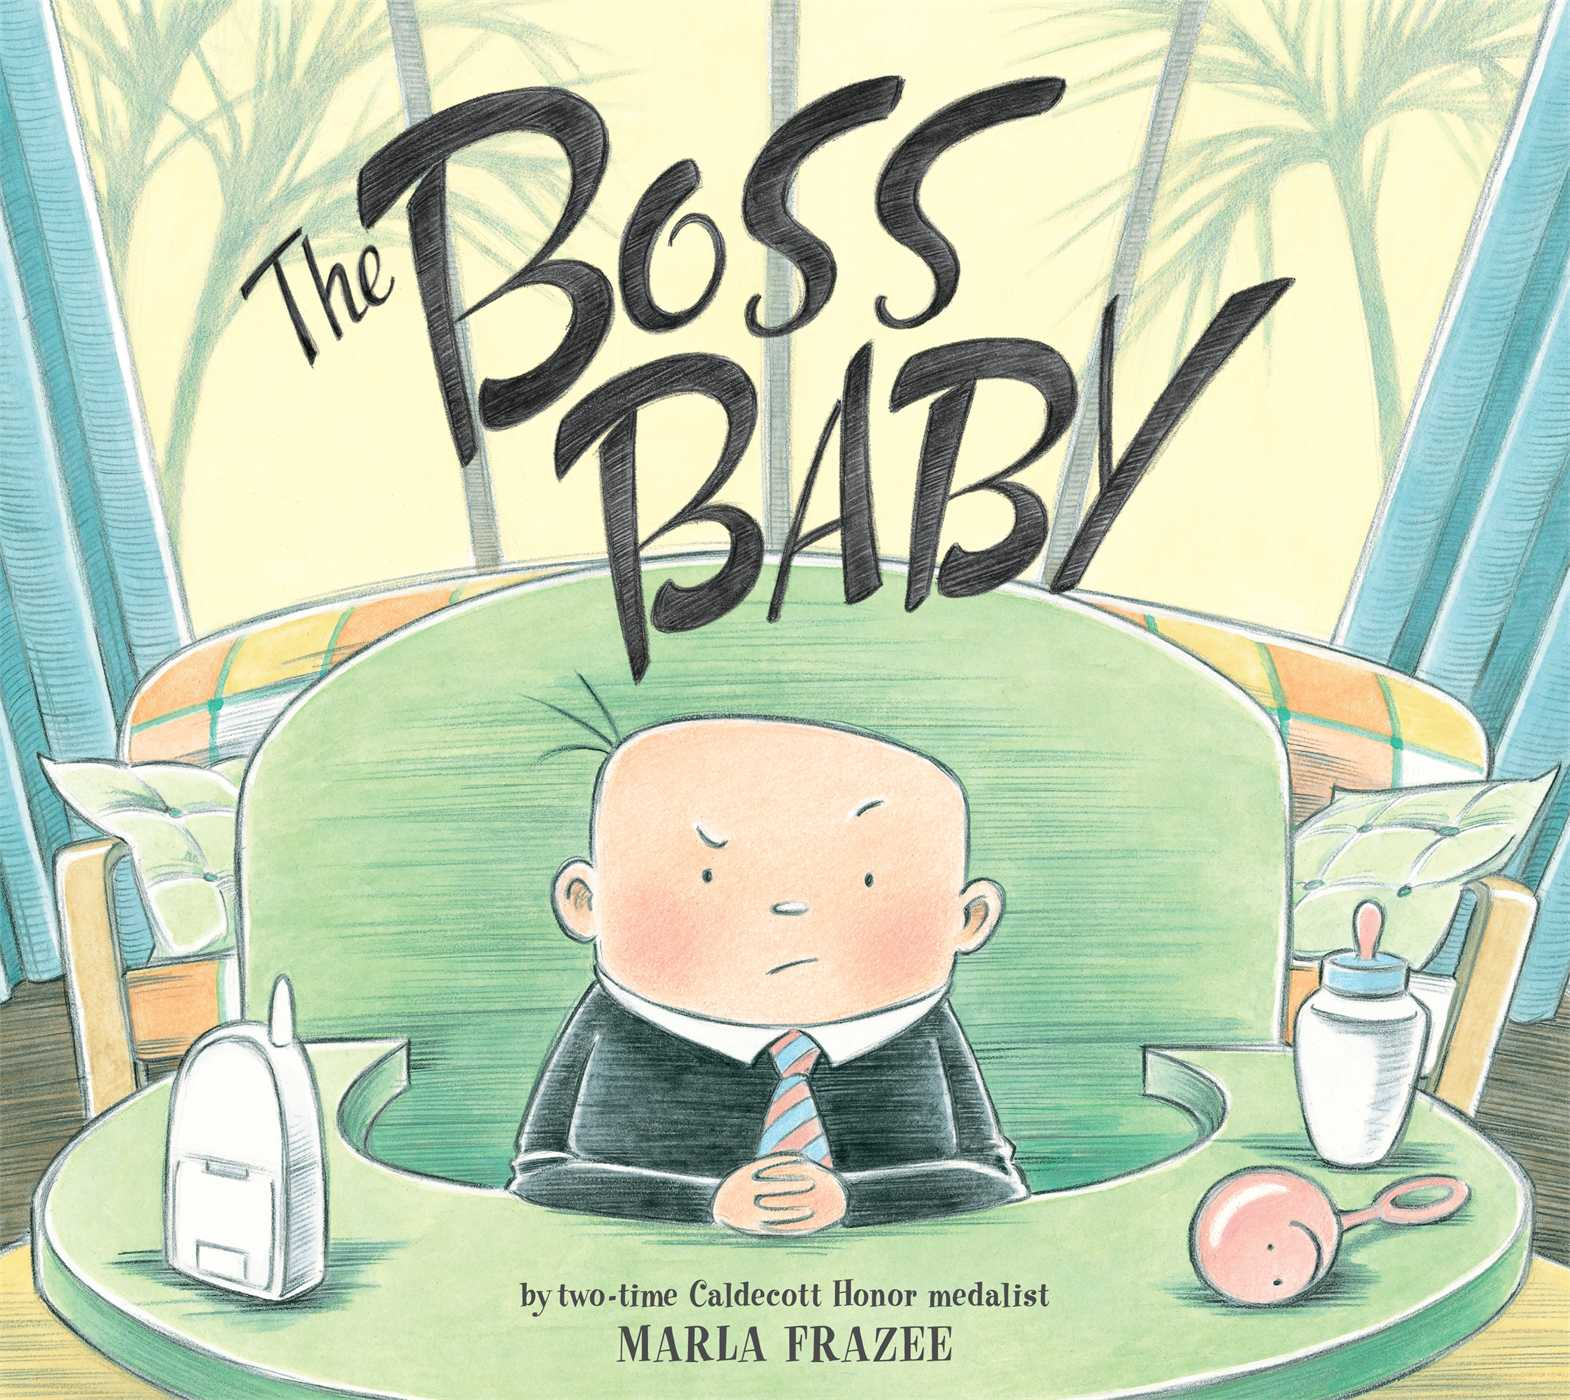 The boss baby 9781442401679 hr